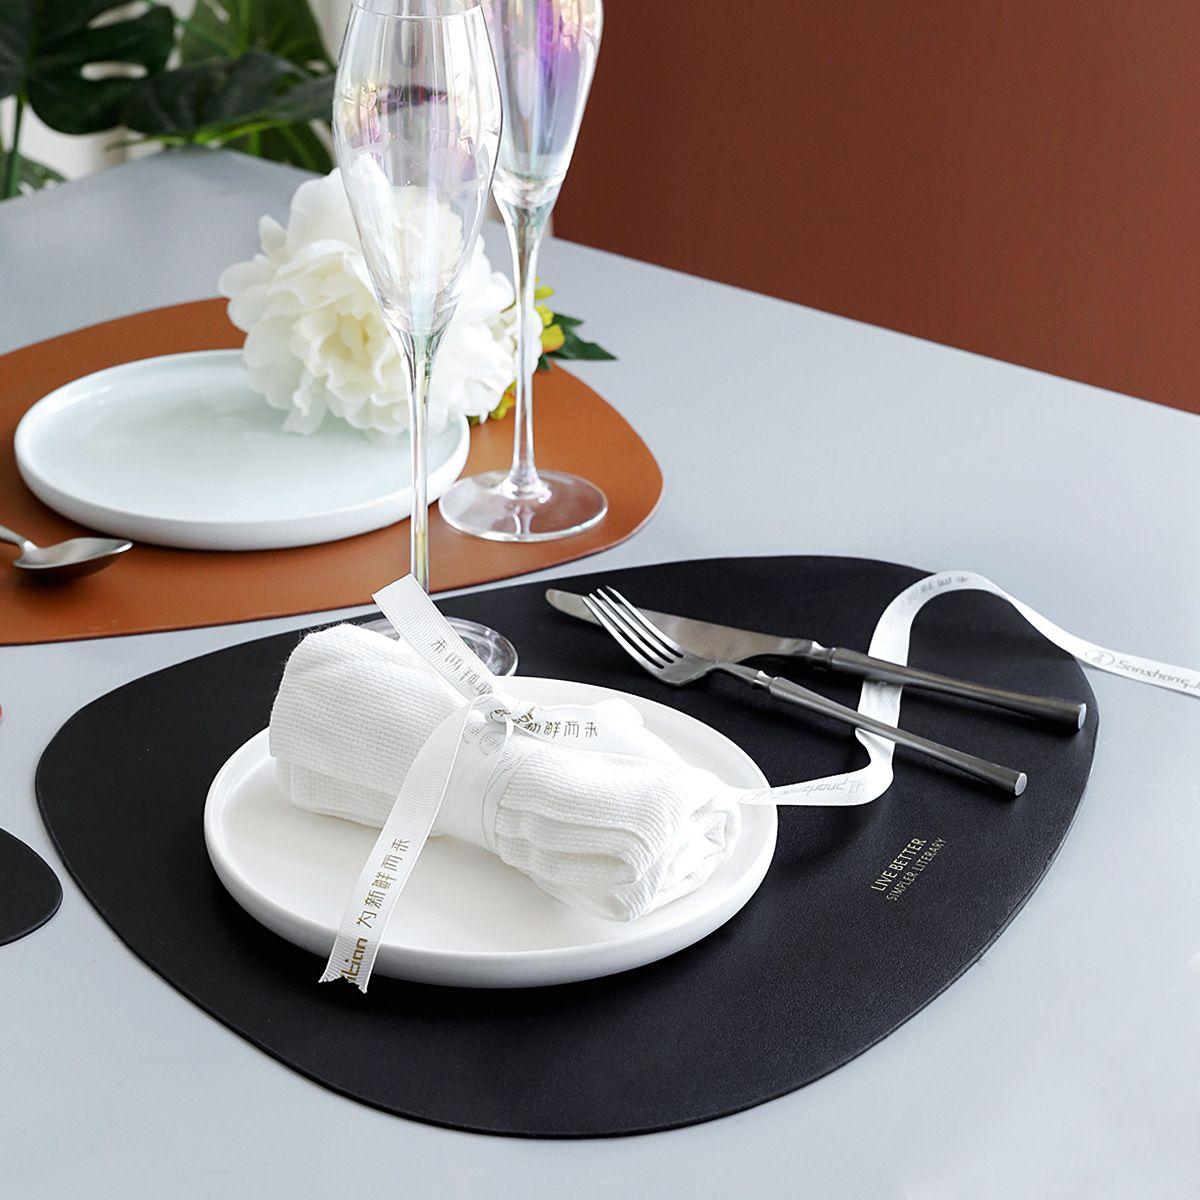 Sofra Pad Placemat Masa Mat PU Deri Isı Yalıtım Kaymaz Basit Placemats Disk Coaster Placemat Yemek Masası için CCA3300